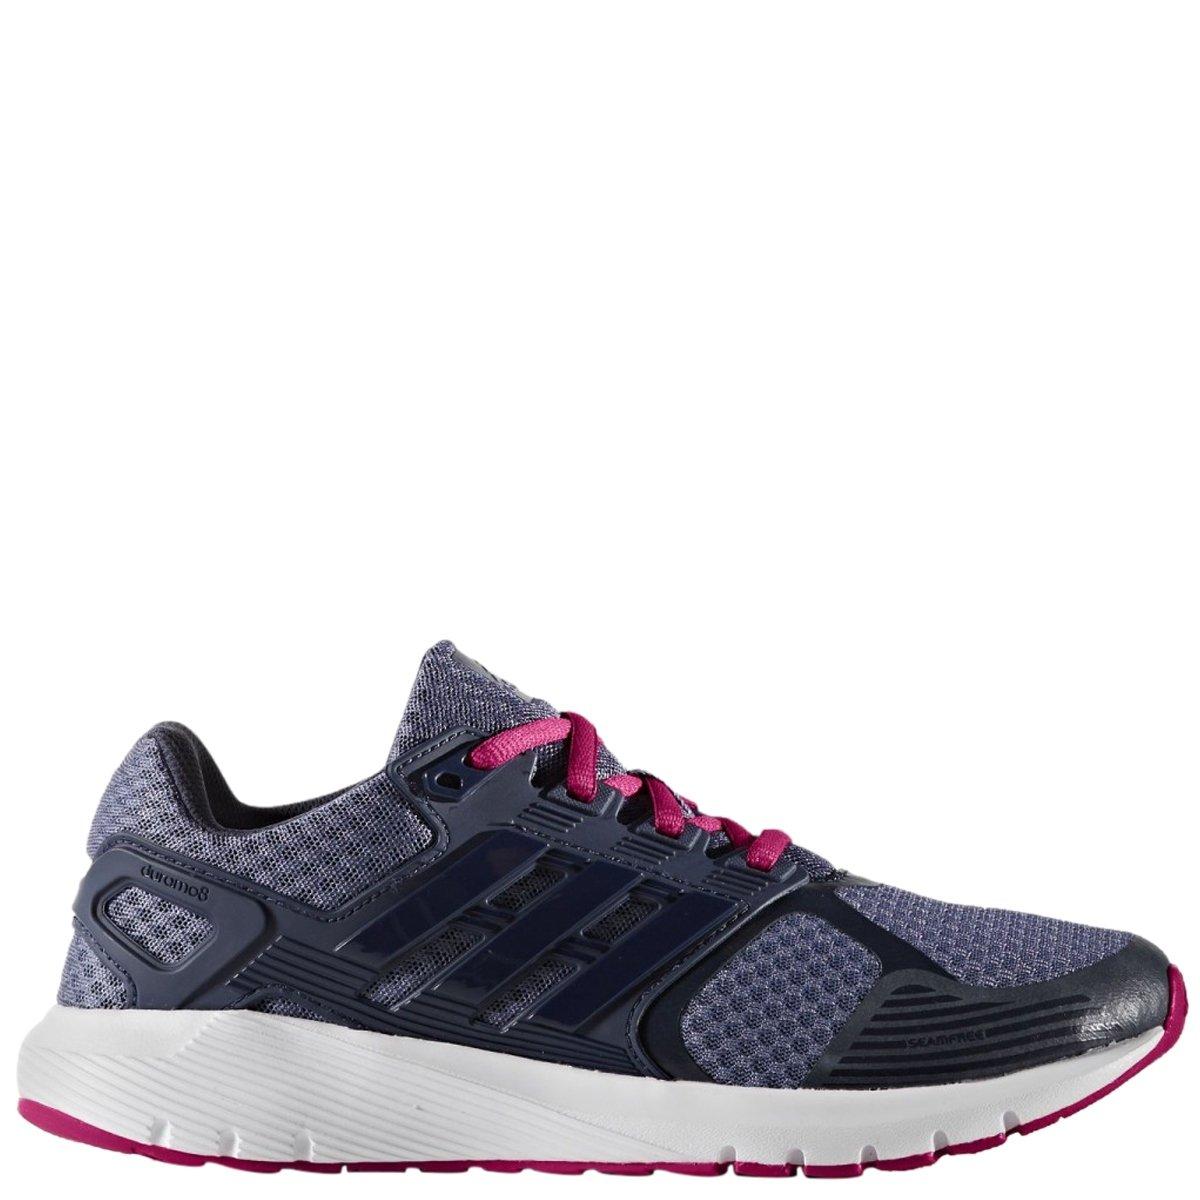 ce05e4026 Bizz Store - Tênis Feminino Adidas Duramo 8 W Corrida Cinza